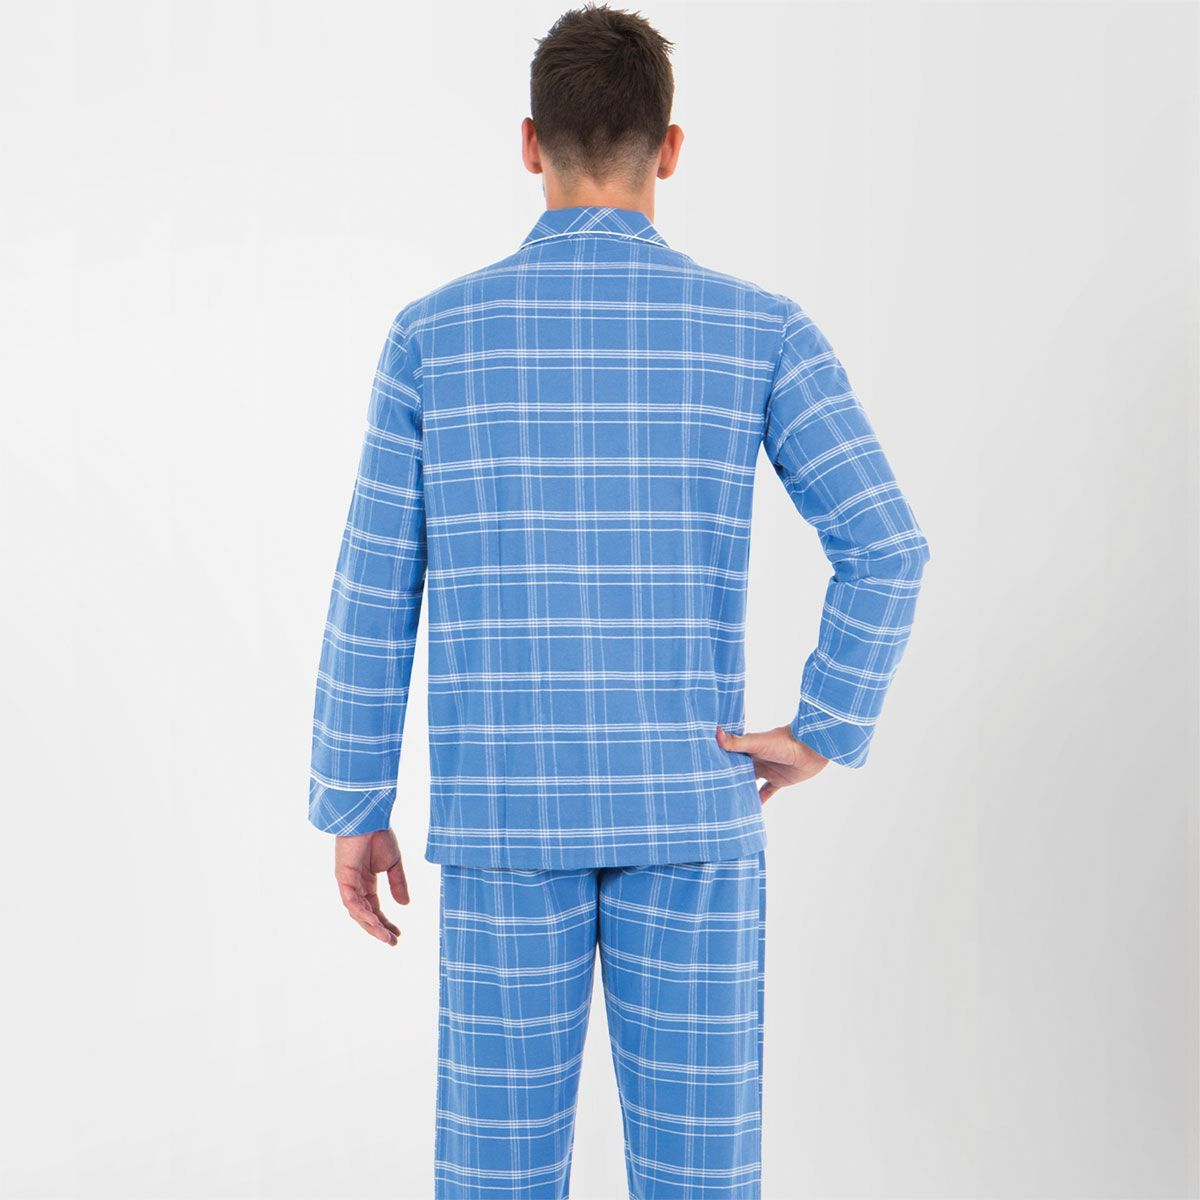 Pyjama Long boutonn/é Homme cha/îne et Trame Heritage Eminence